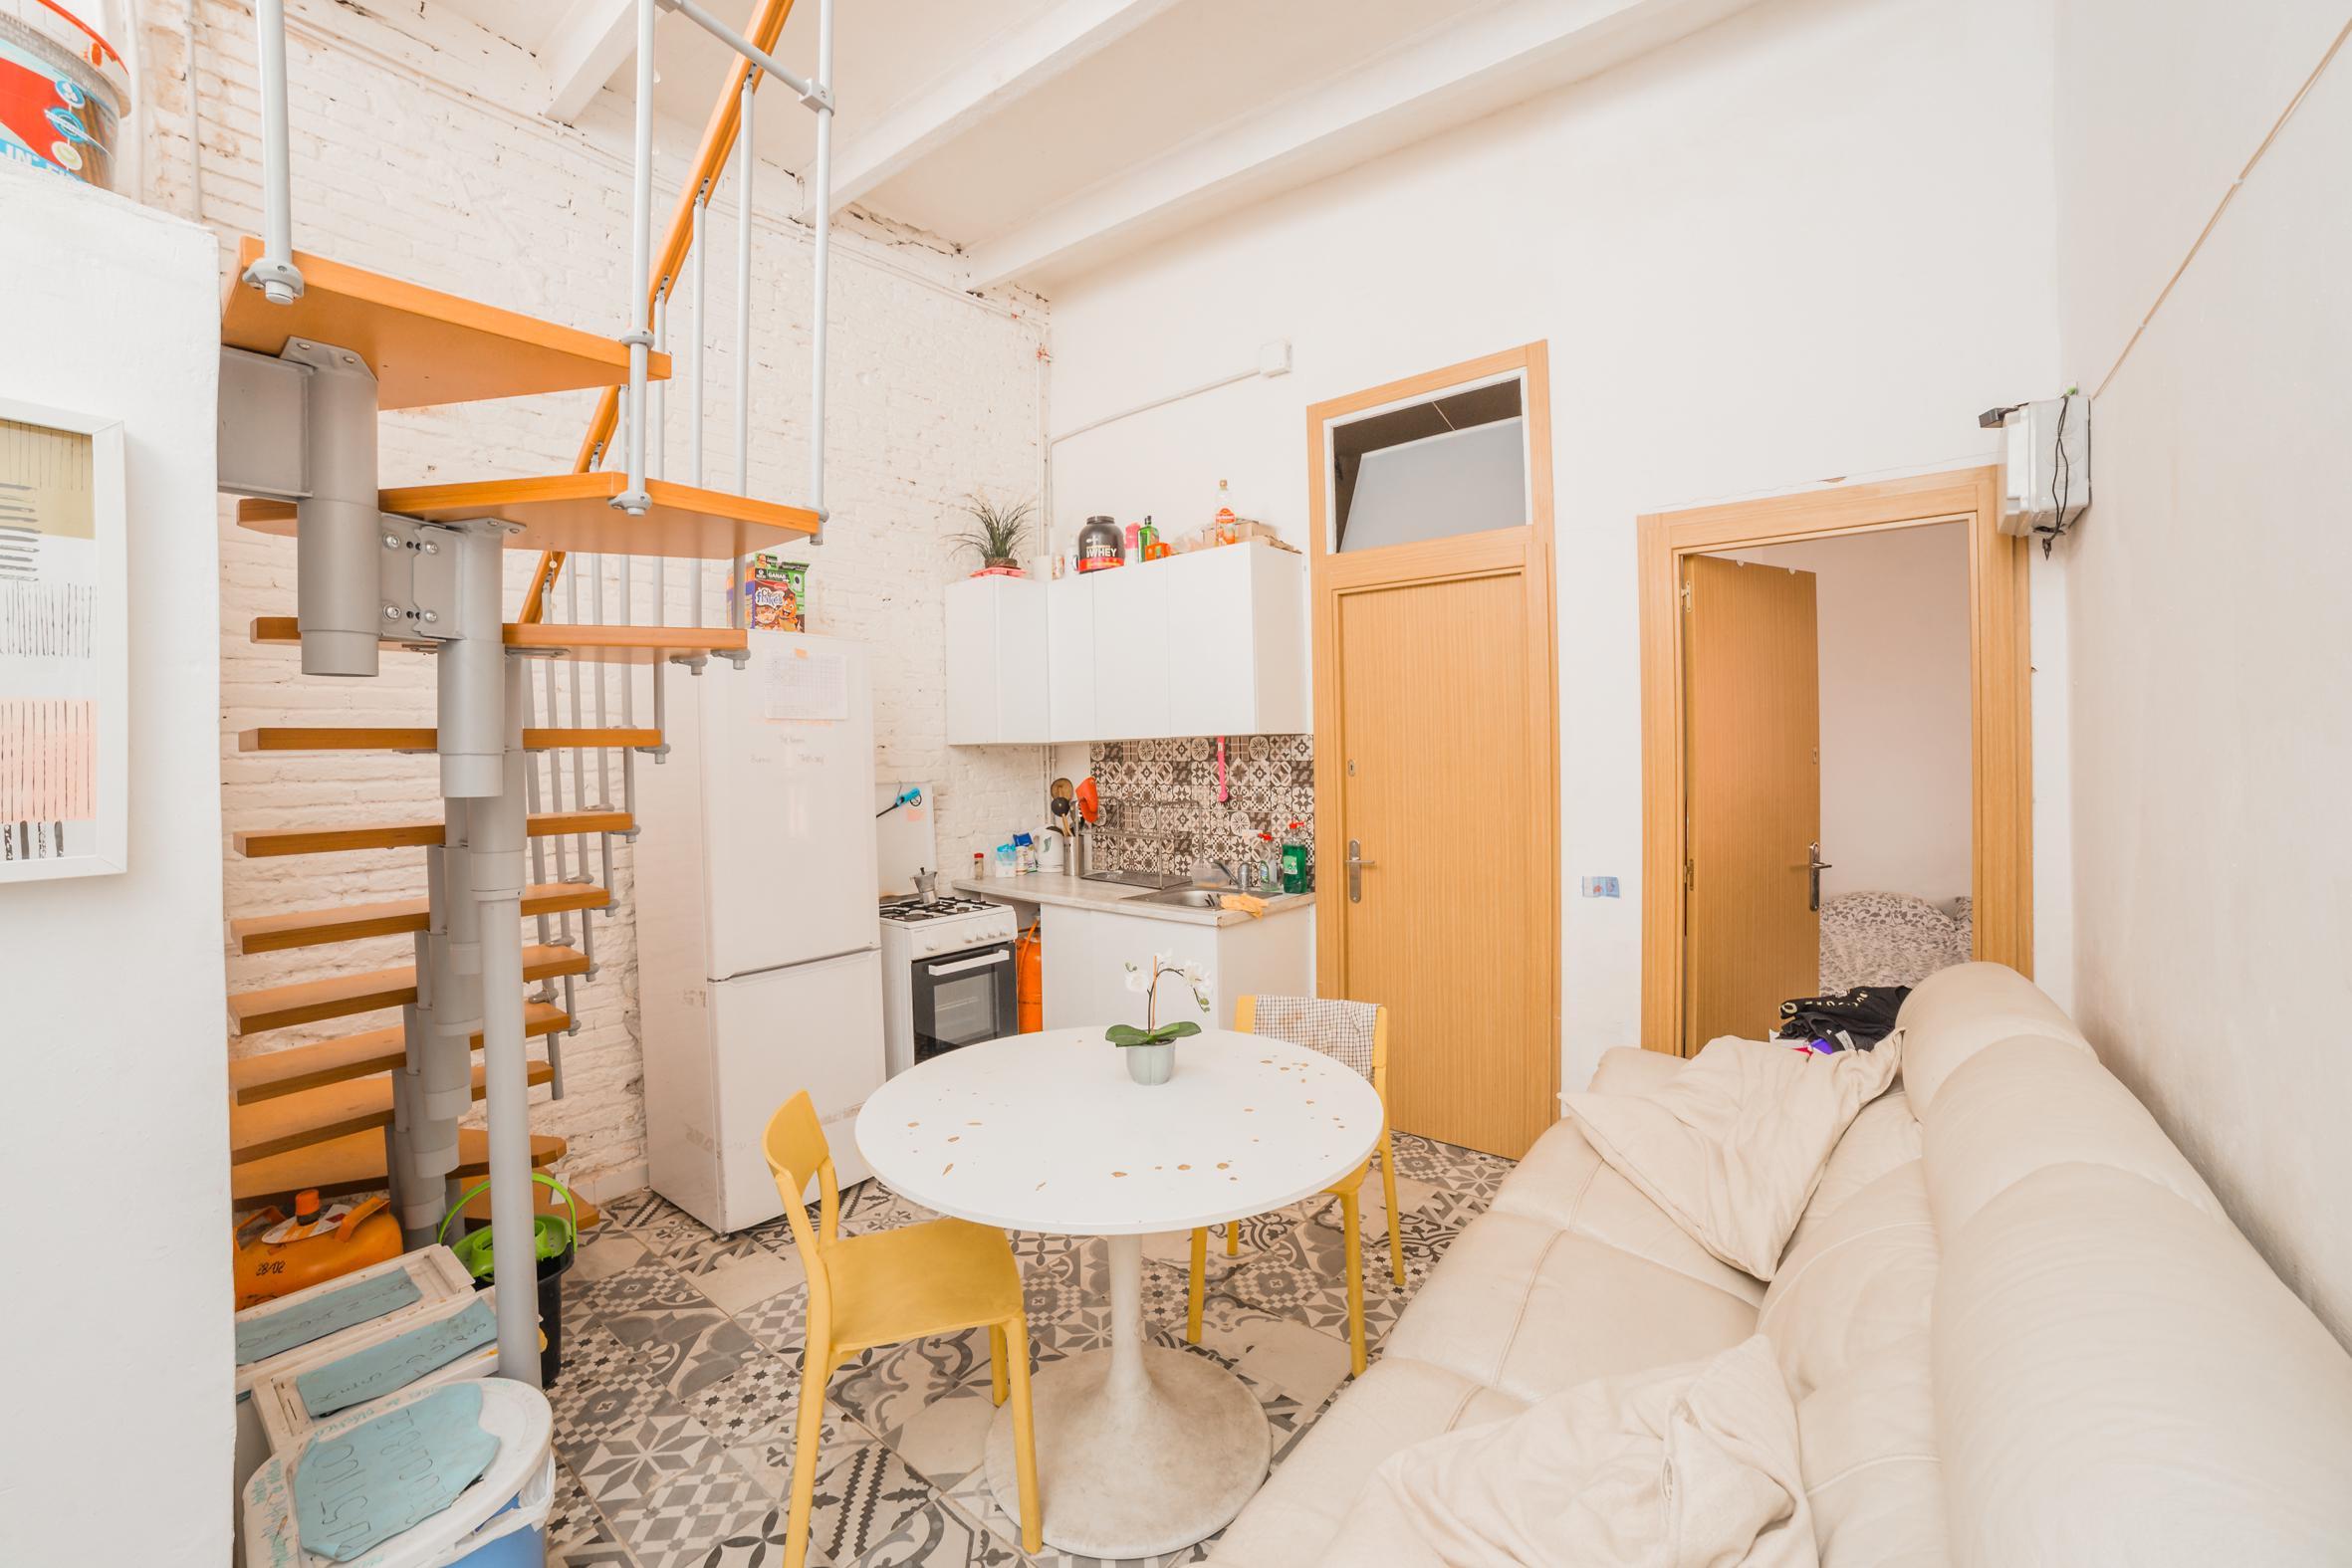 251960 House for sale in Eixample, Sagrada Familia 2